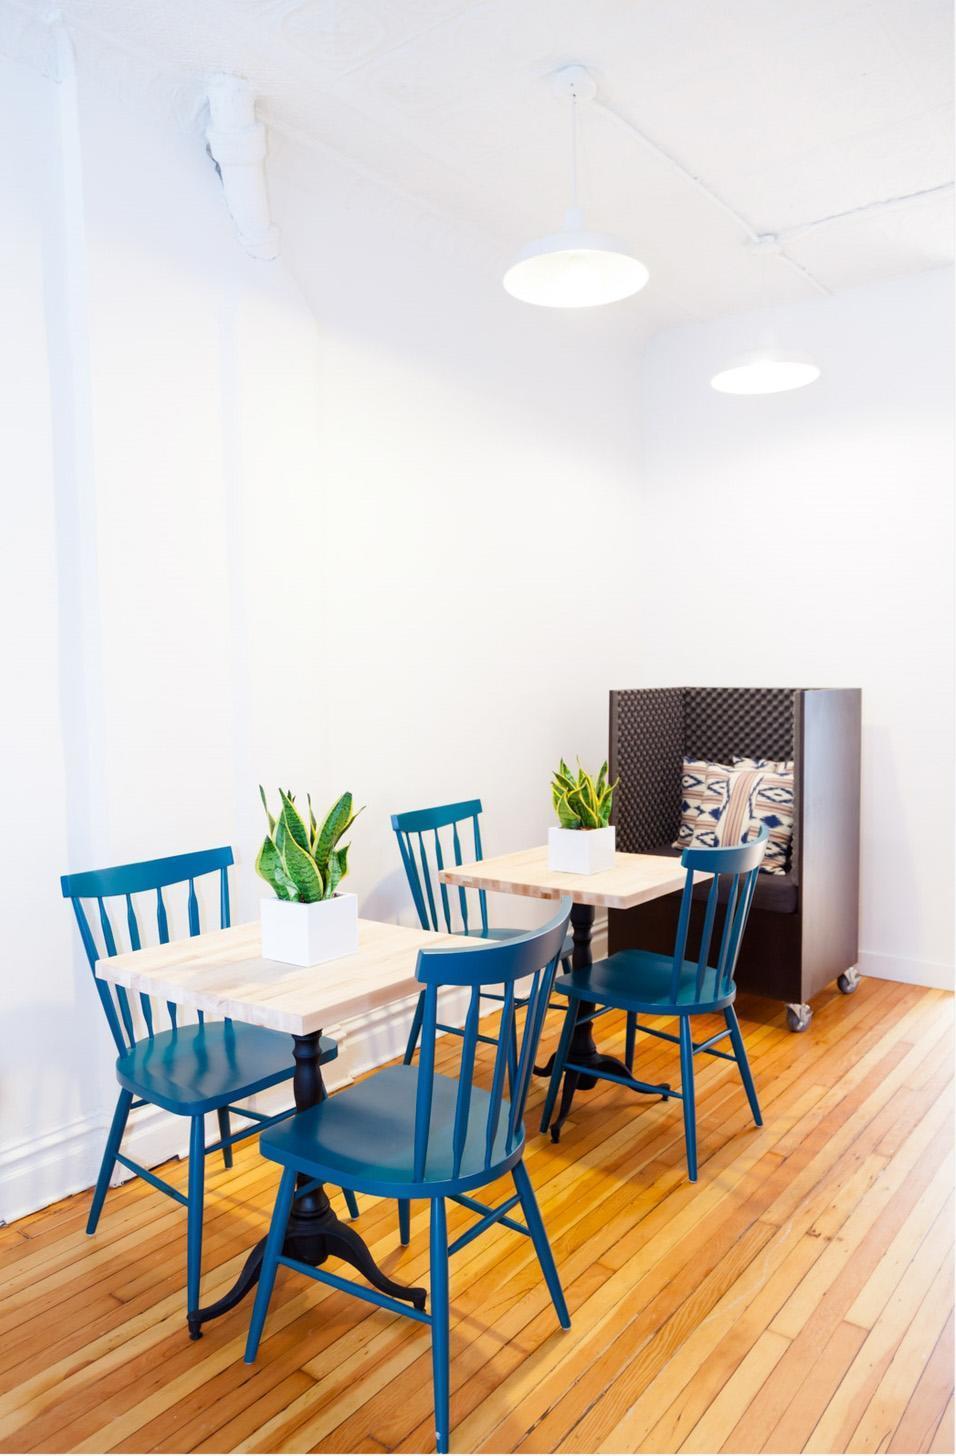 memoir-estimote-new-york-office-7